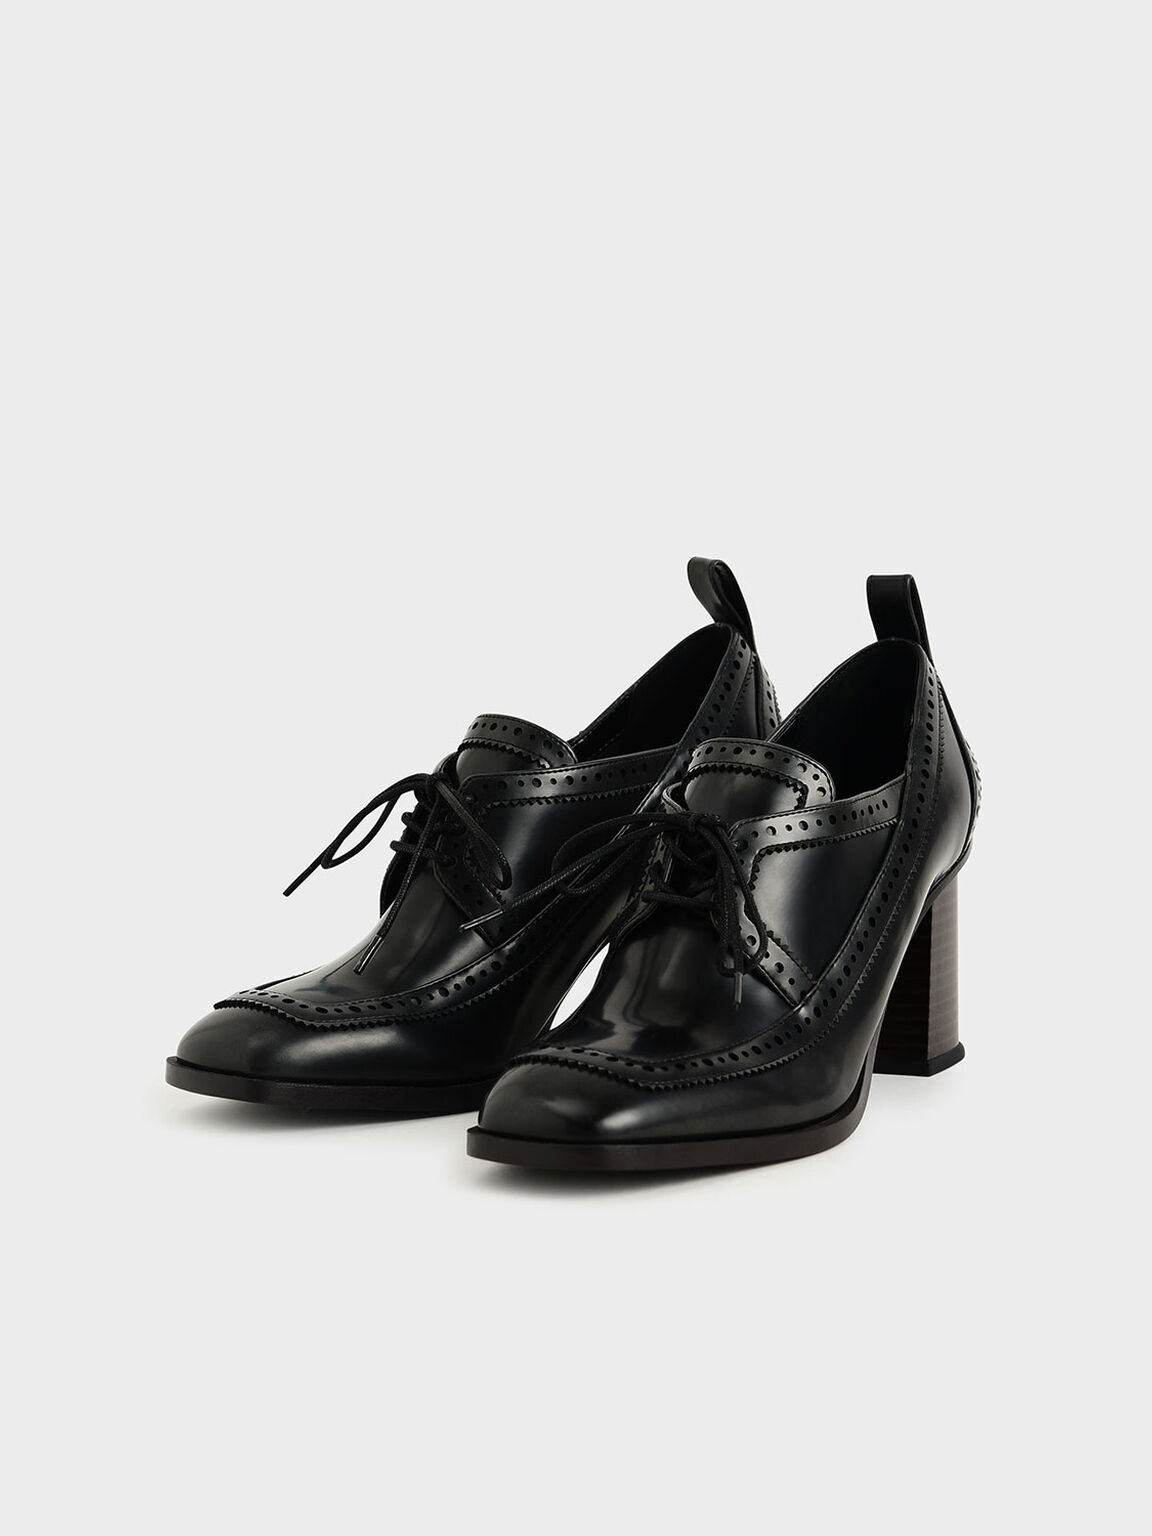 雕花牛津粗跟鞋, 黑色, hi-res